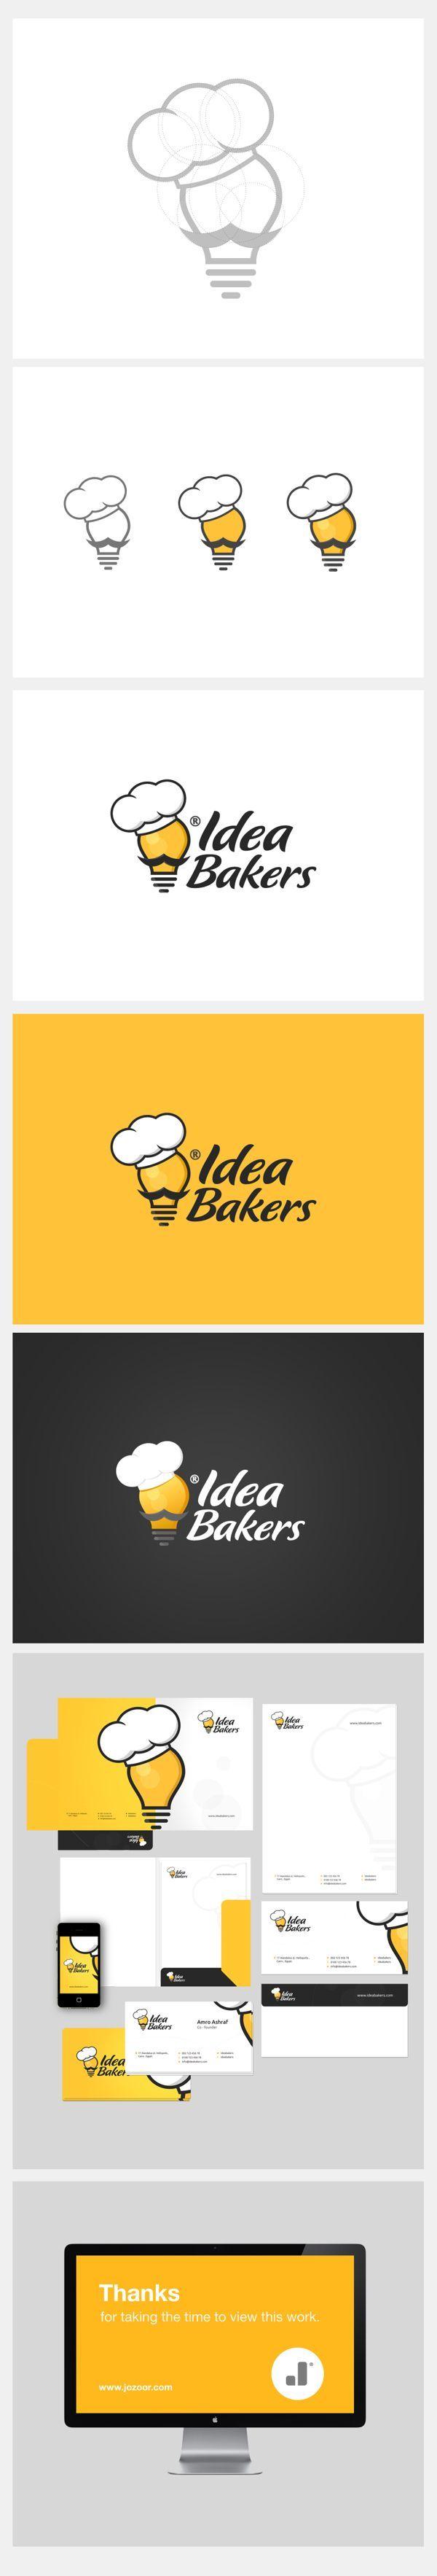 Identidade visual da Idea Bakers por Jozoor. Via Behance #design #branding